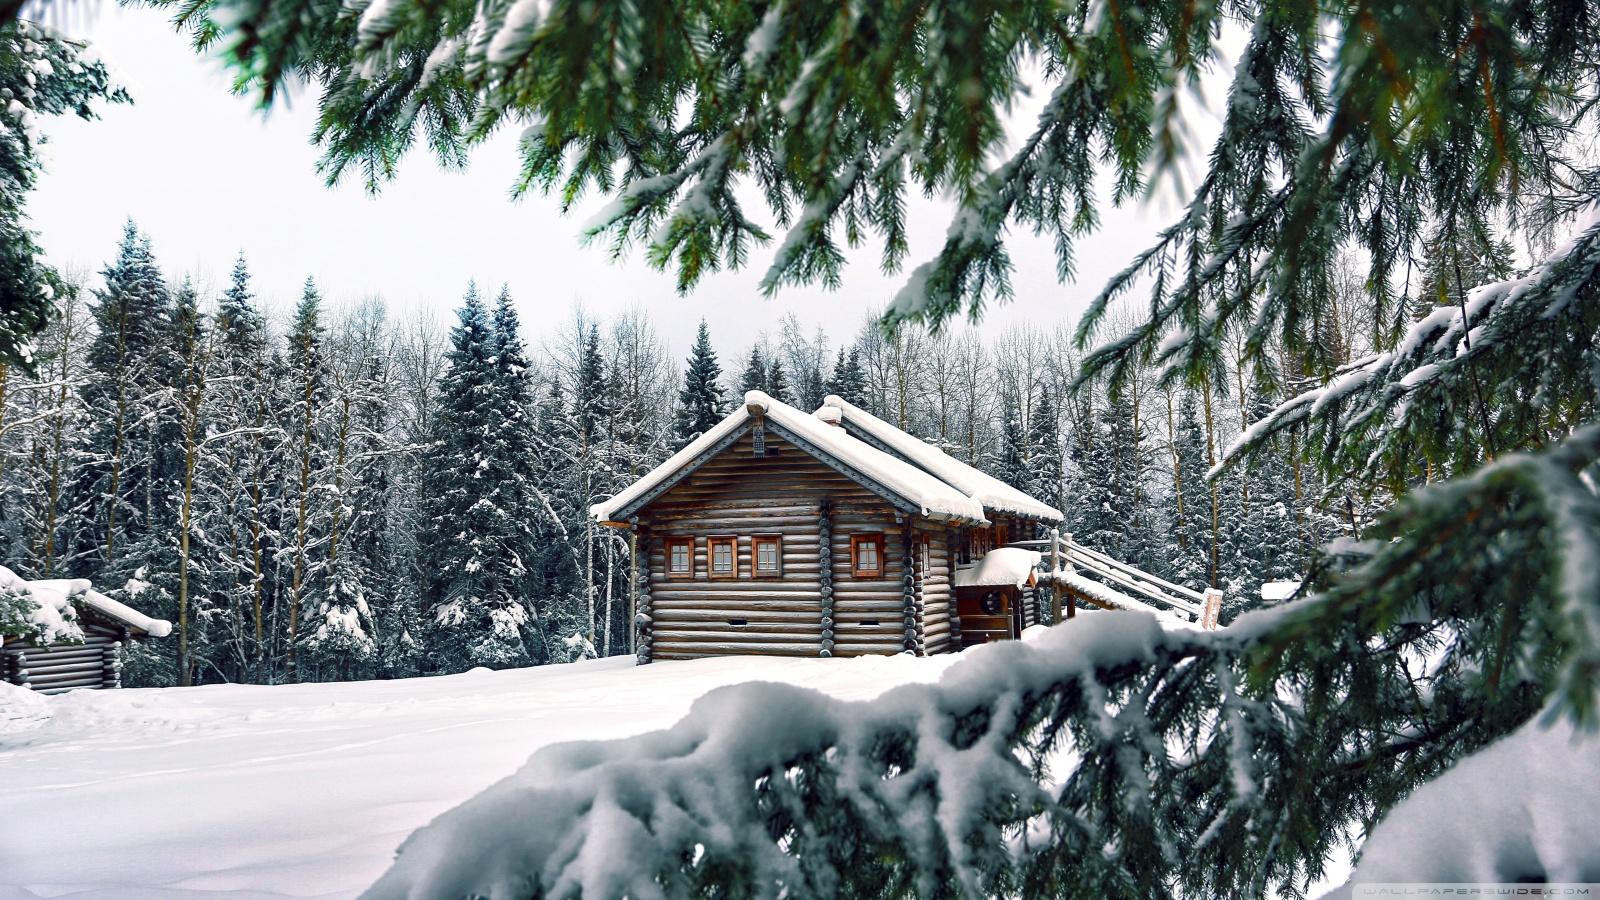 Mountain Retreat Winter Ultra HD Desktop Background Wallpaper for 1600x900